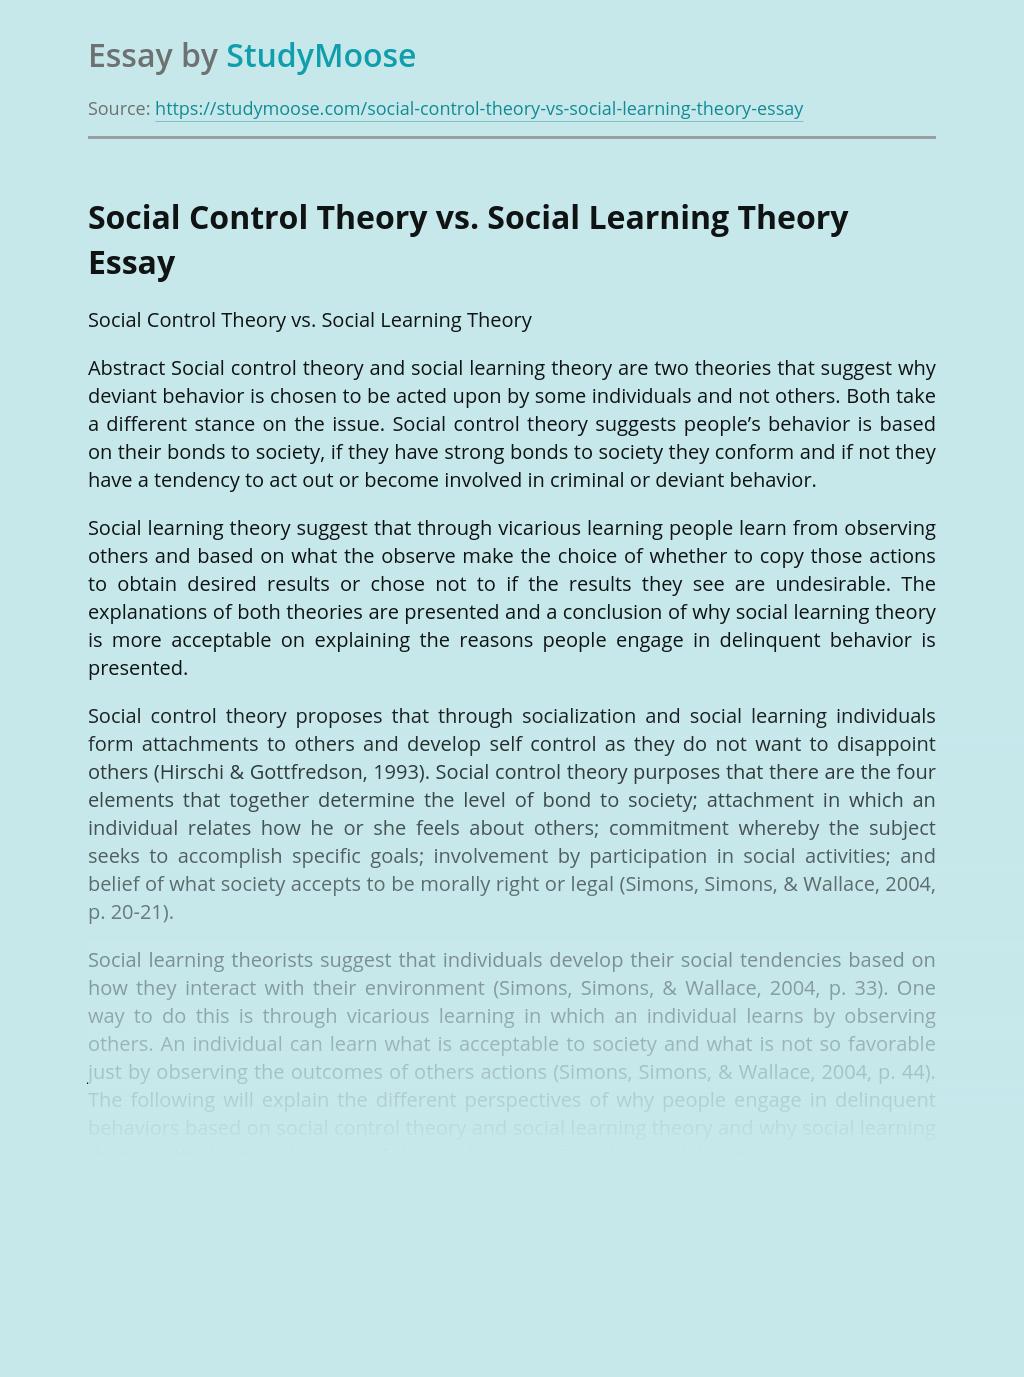 Social Control Theory vs. Social Learning Theory